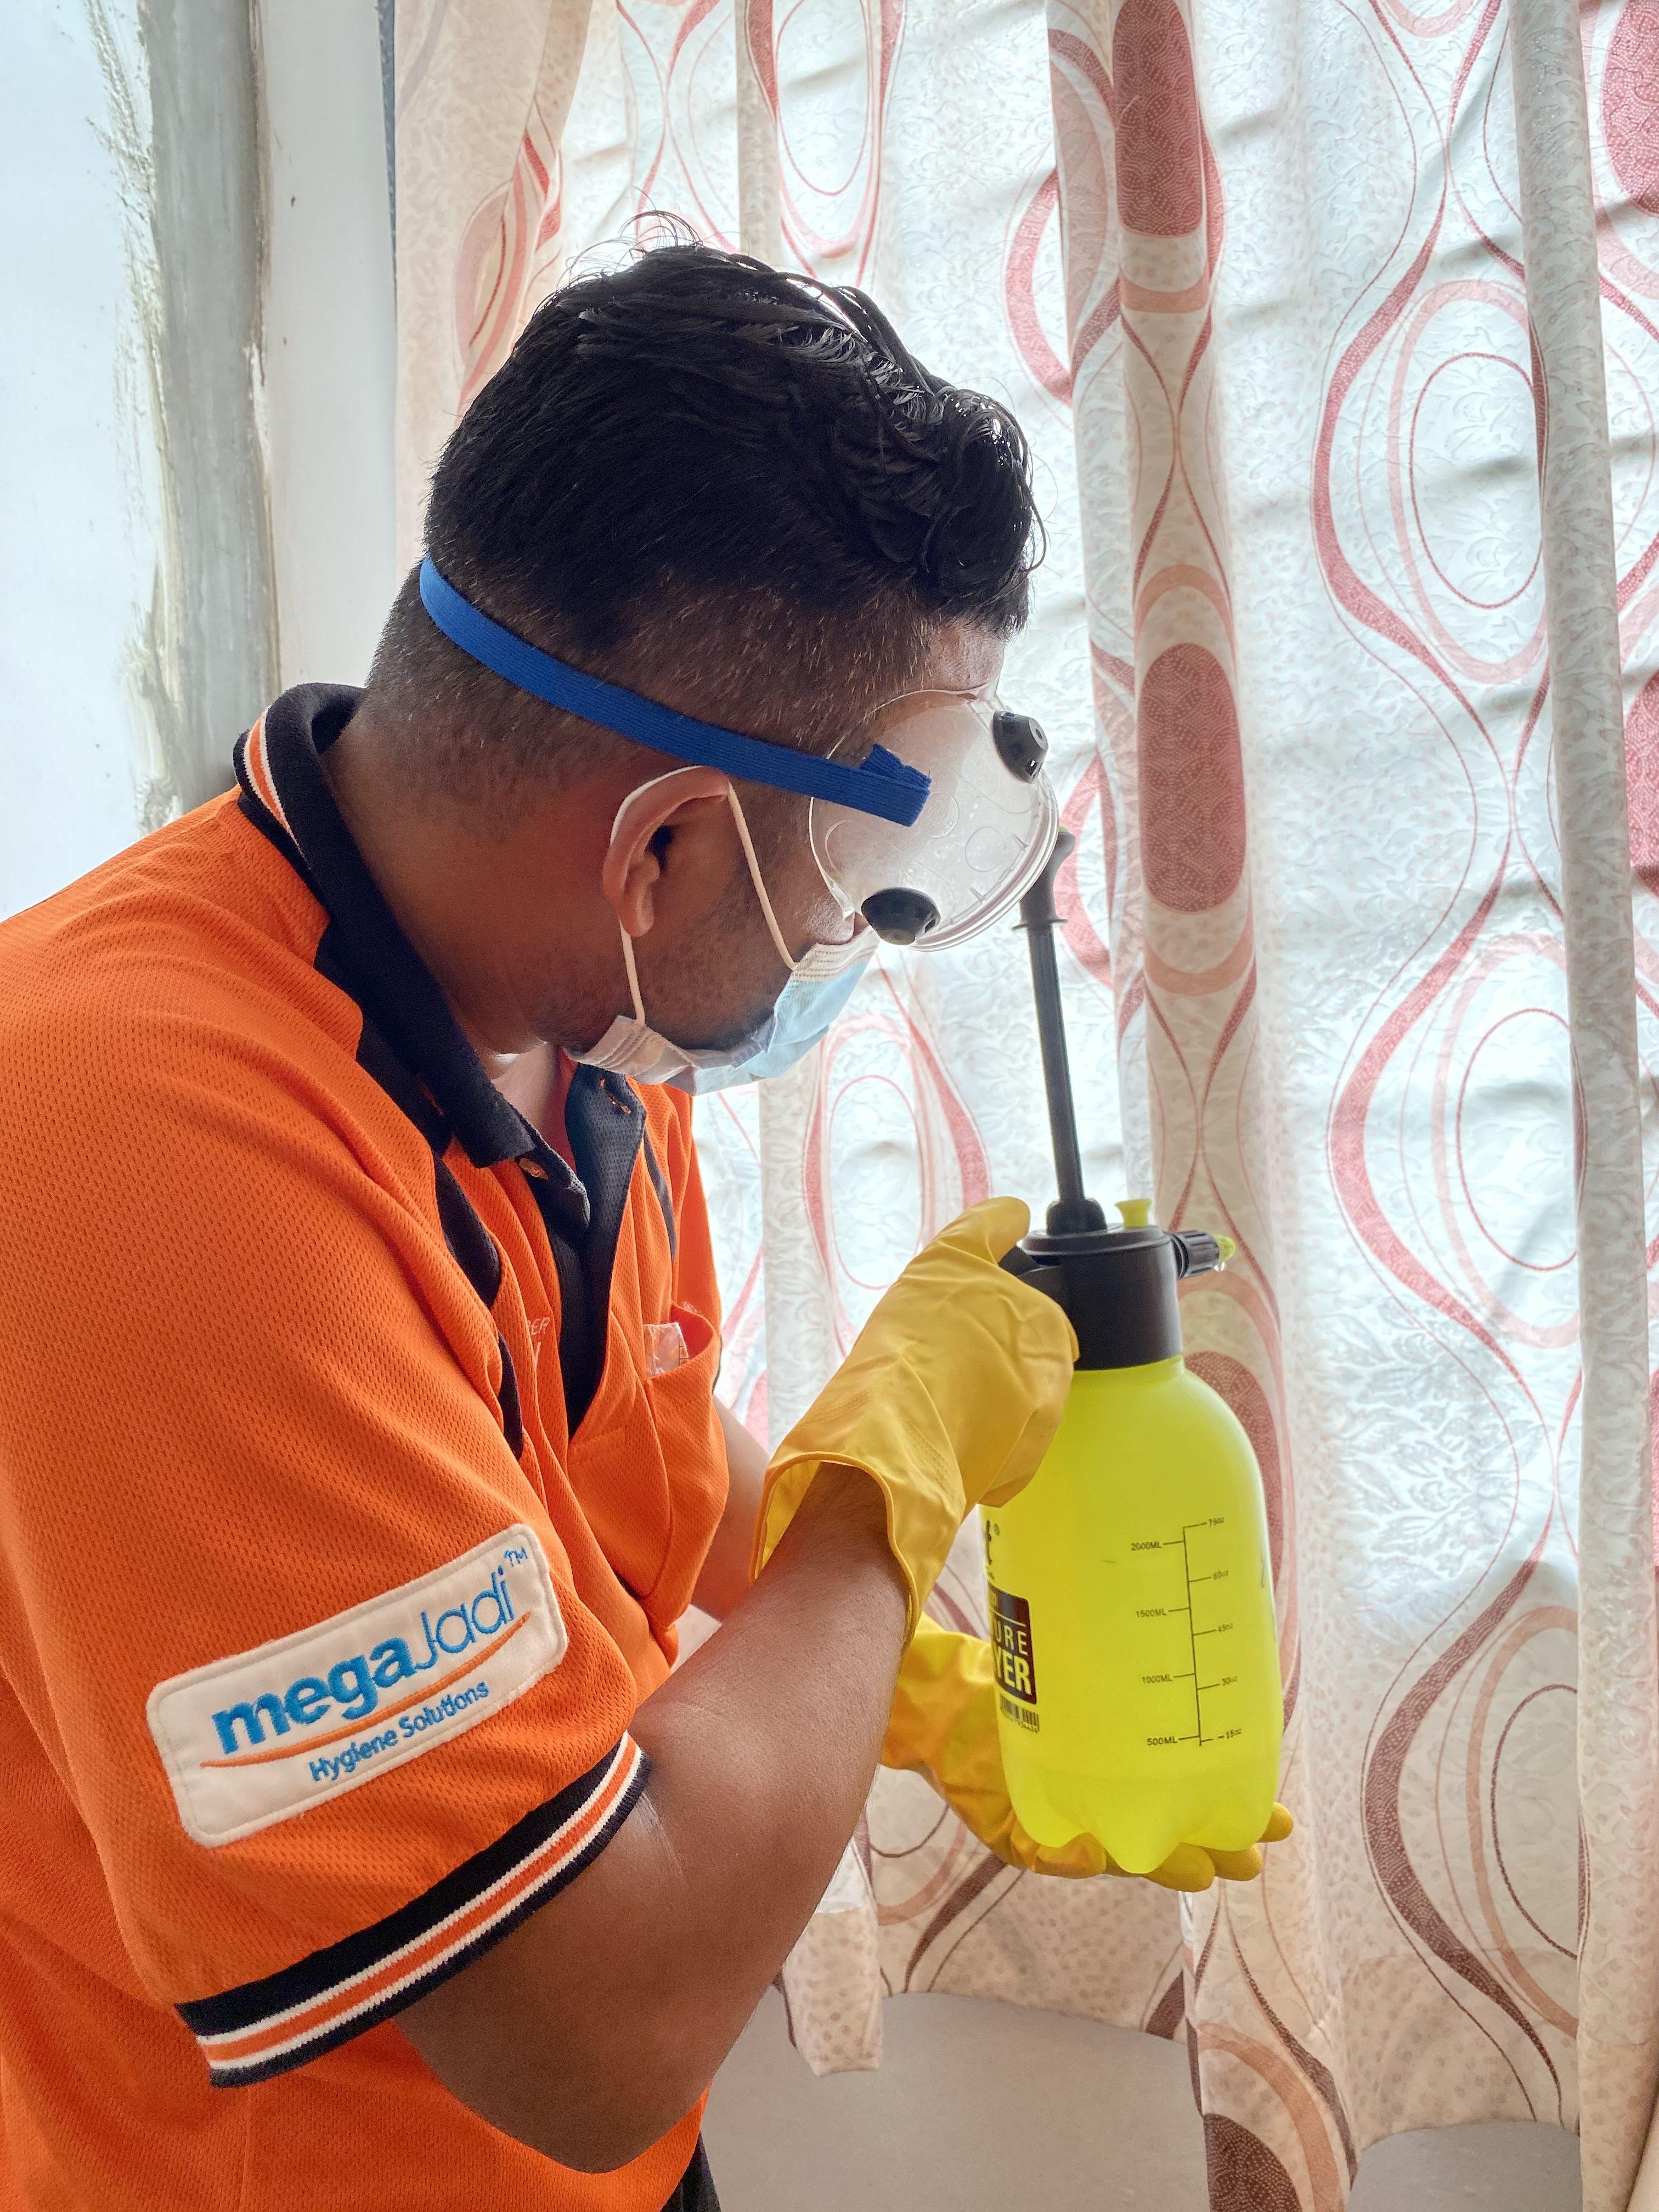 megajadi-hygiene-solutions-房屋清洁服务